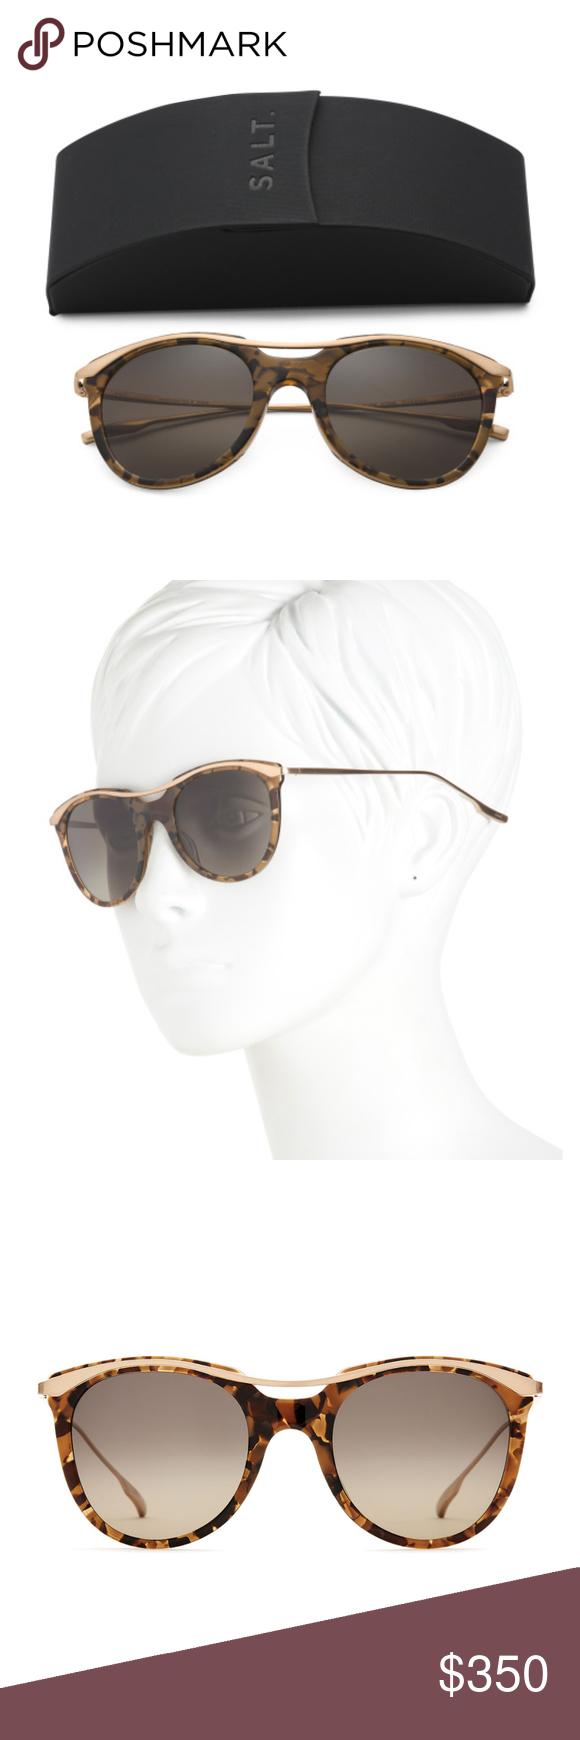 6033dab2fd8 SALT Made in Japan Elkins Polarized Sunglasses New with case.  Lens bridge temple